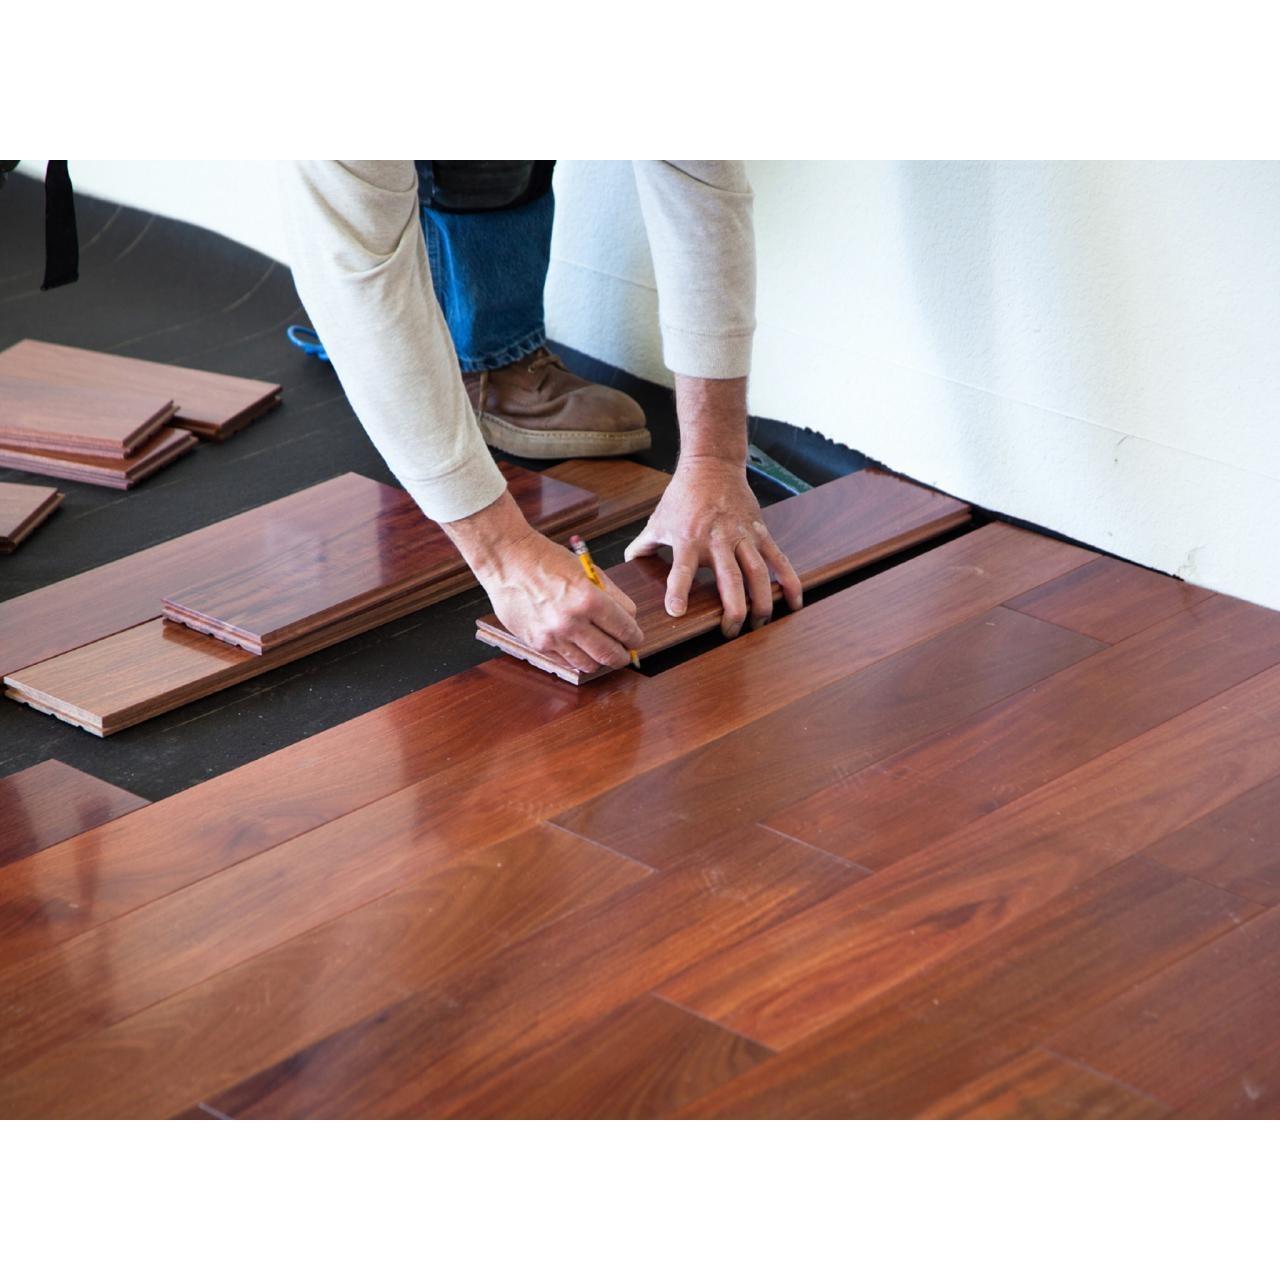 Oklahoma Flooring and Construction Innovations Inc - Oklahoma City, OK - Tile Contractors & Shops